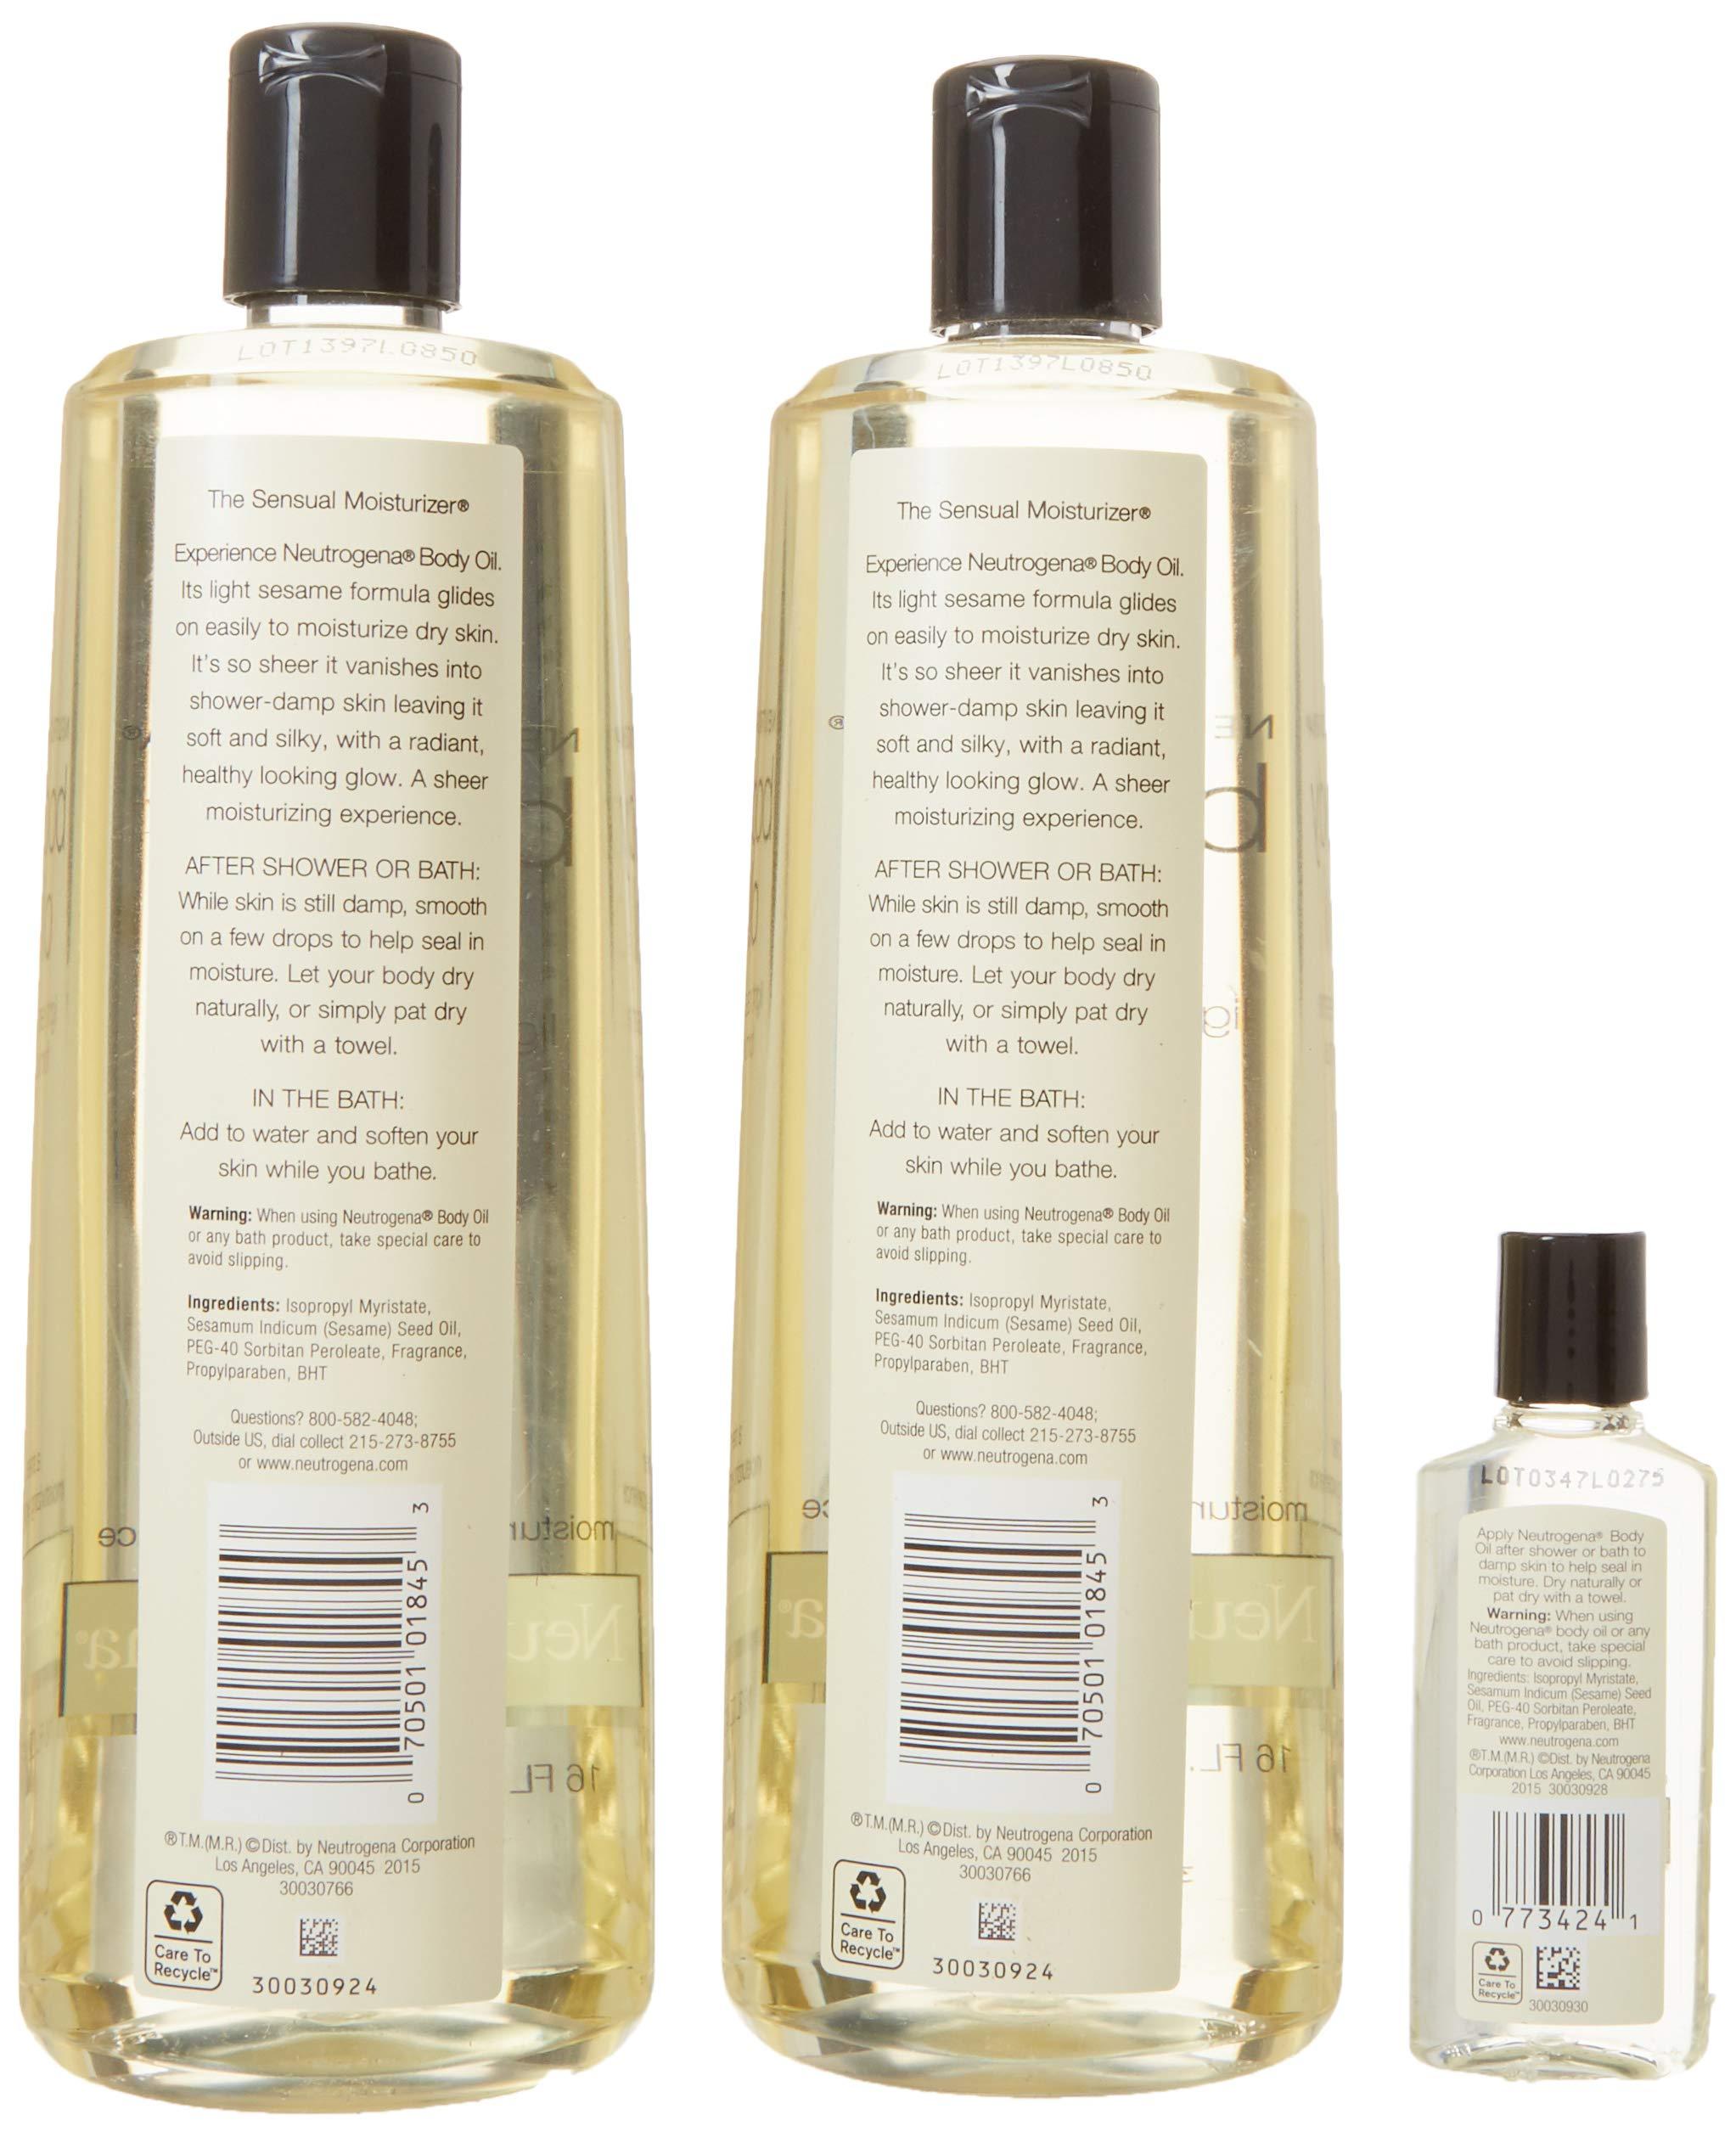 2 Pack of Neutrogena Body Oil Light Sesame Formula, 2-16 fl. oz bottles, Total of 32 fl. oz. by Neutrogena (Image #5)